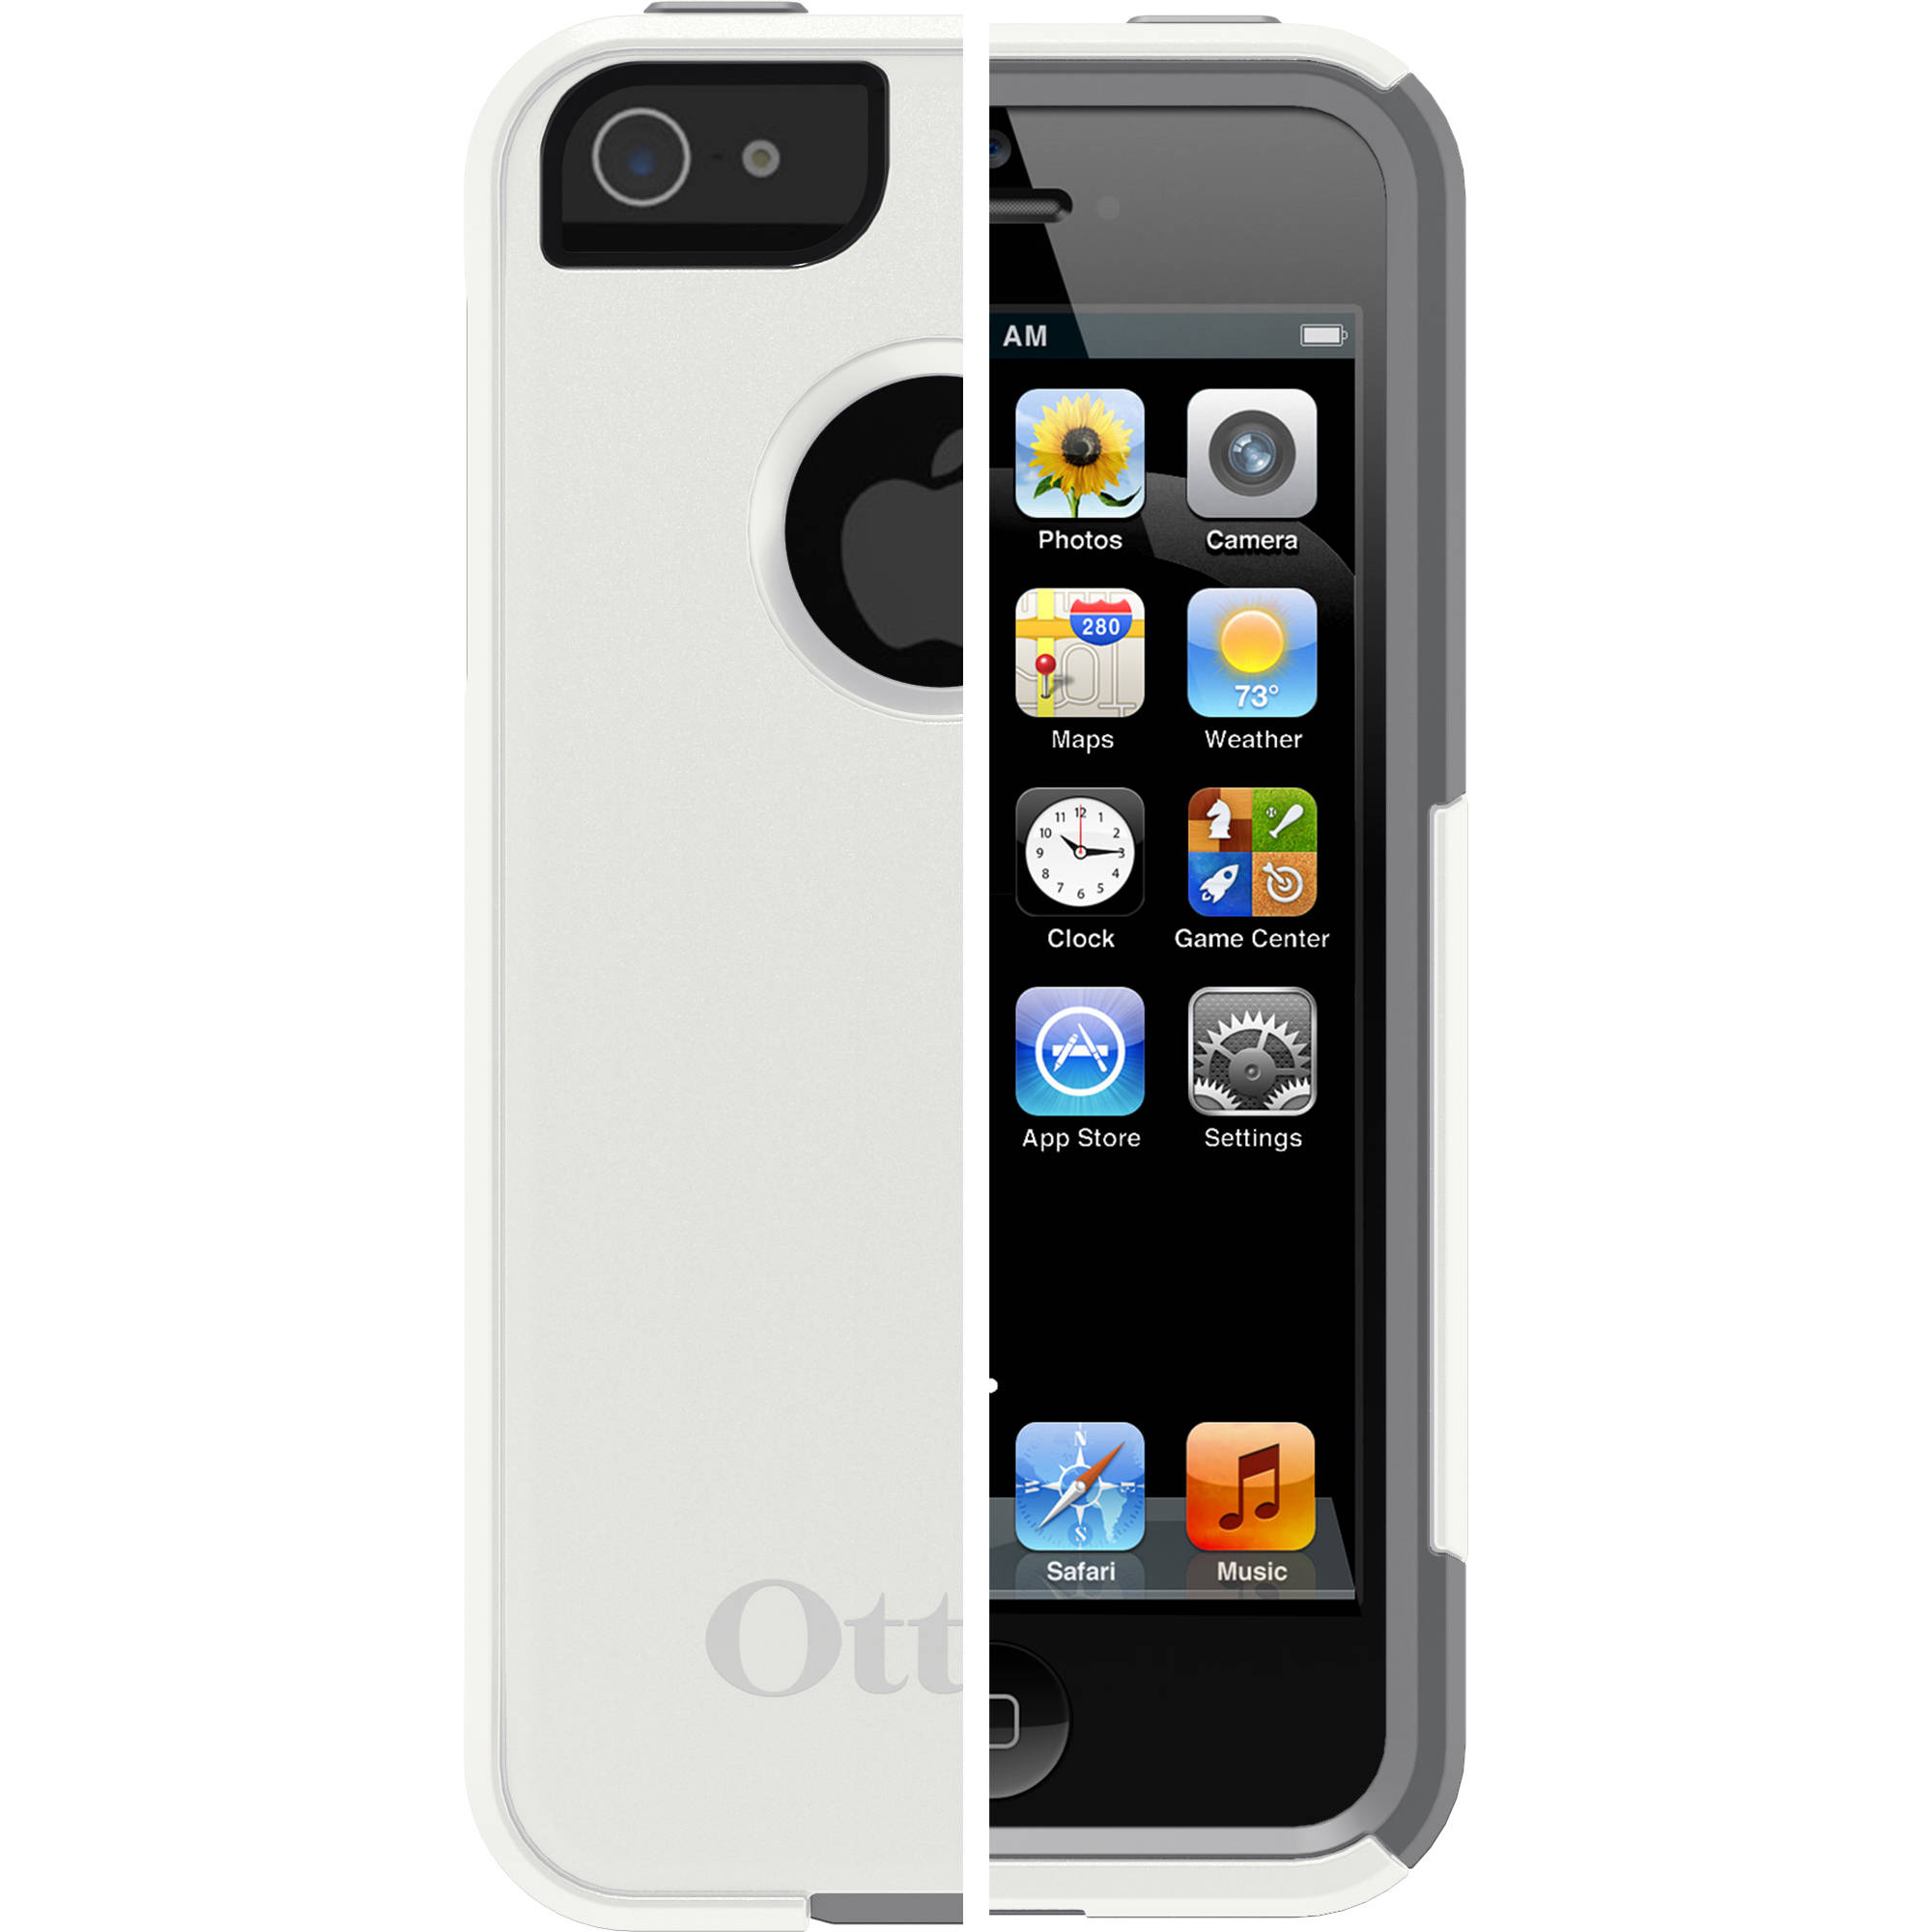 OtterBox Apple iPhone 5/5SE/5s Case Commuter Series, Glacier